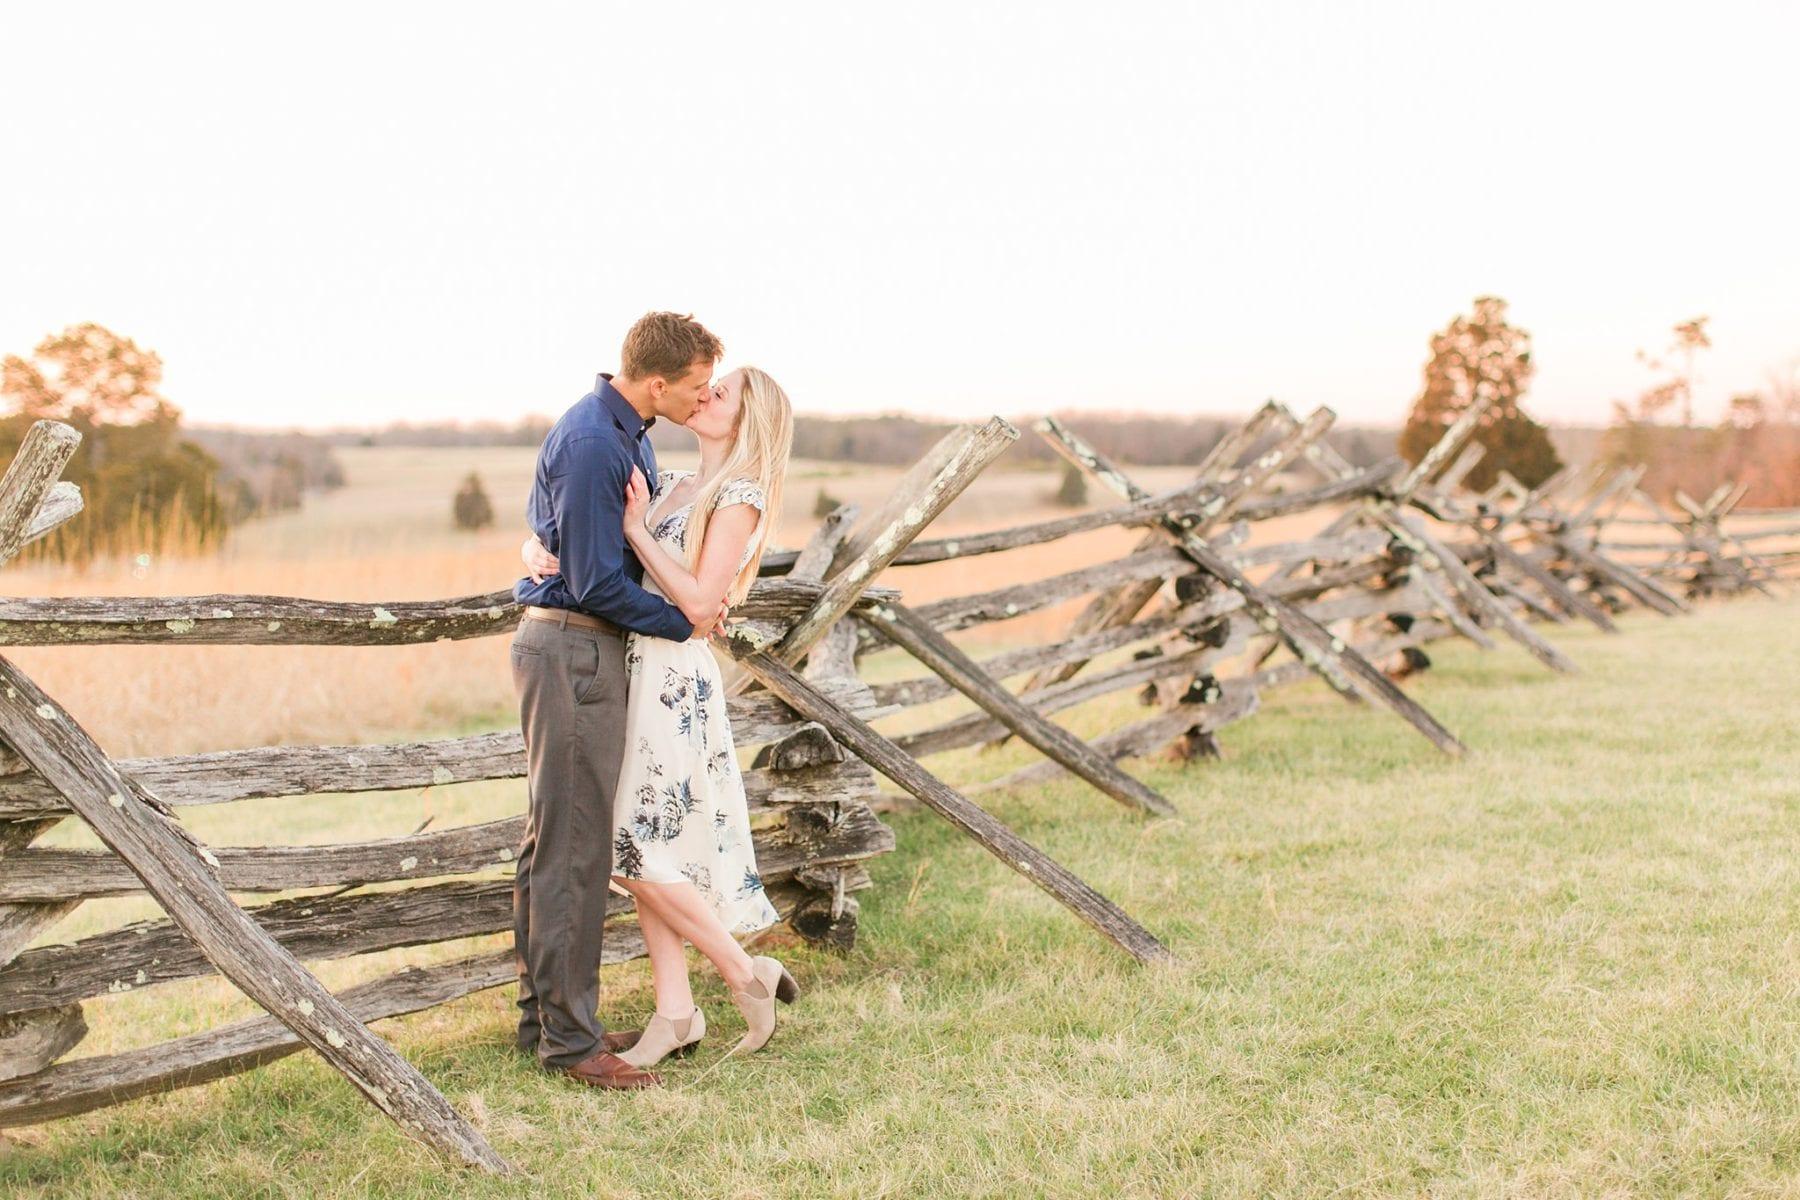 Manassas Battlefield Engagement Session Virginia Wedding Photographer Danielle & Charlie Megan Kelsey Photography-6341.jpg